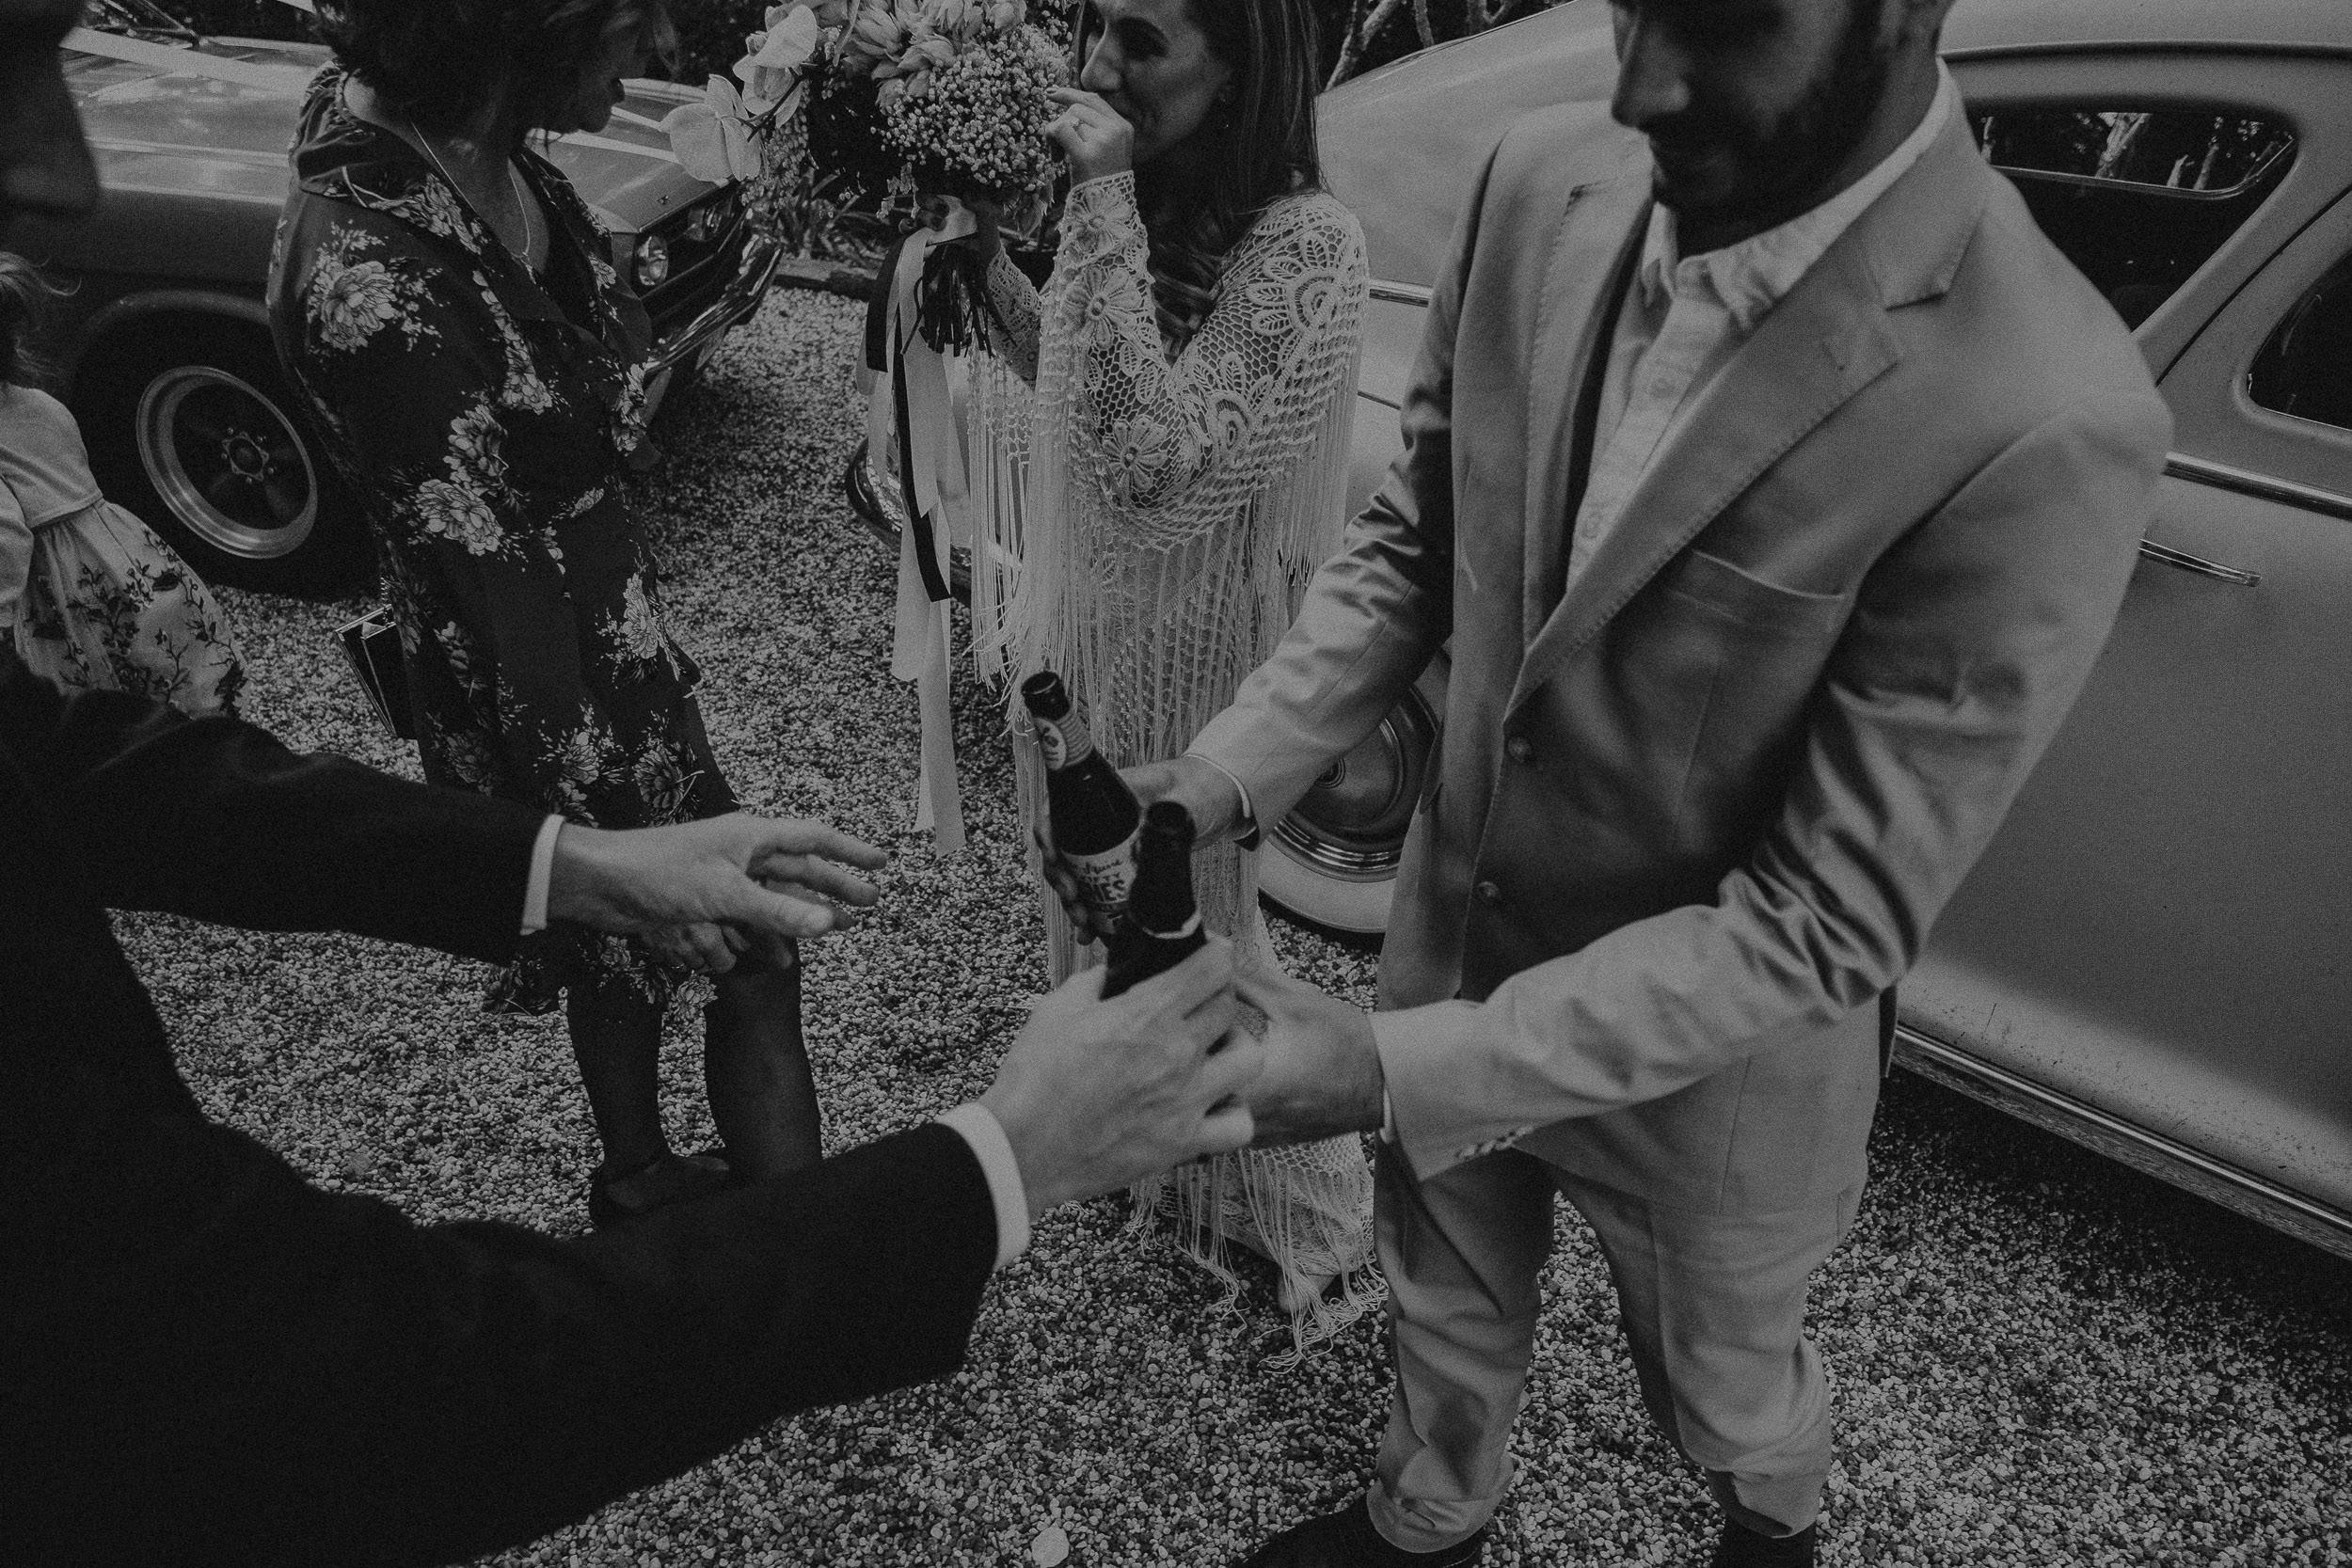 S&A Elopement - Kings & Thieves - Shred 'Til Dead - Central Coast Beach Forest Wedding - 328.jpg